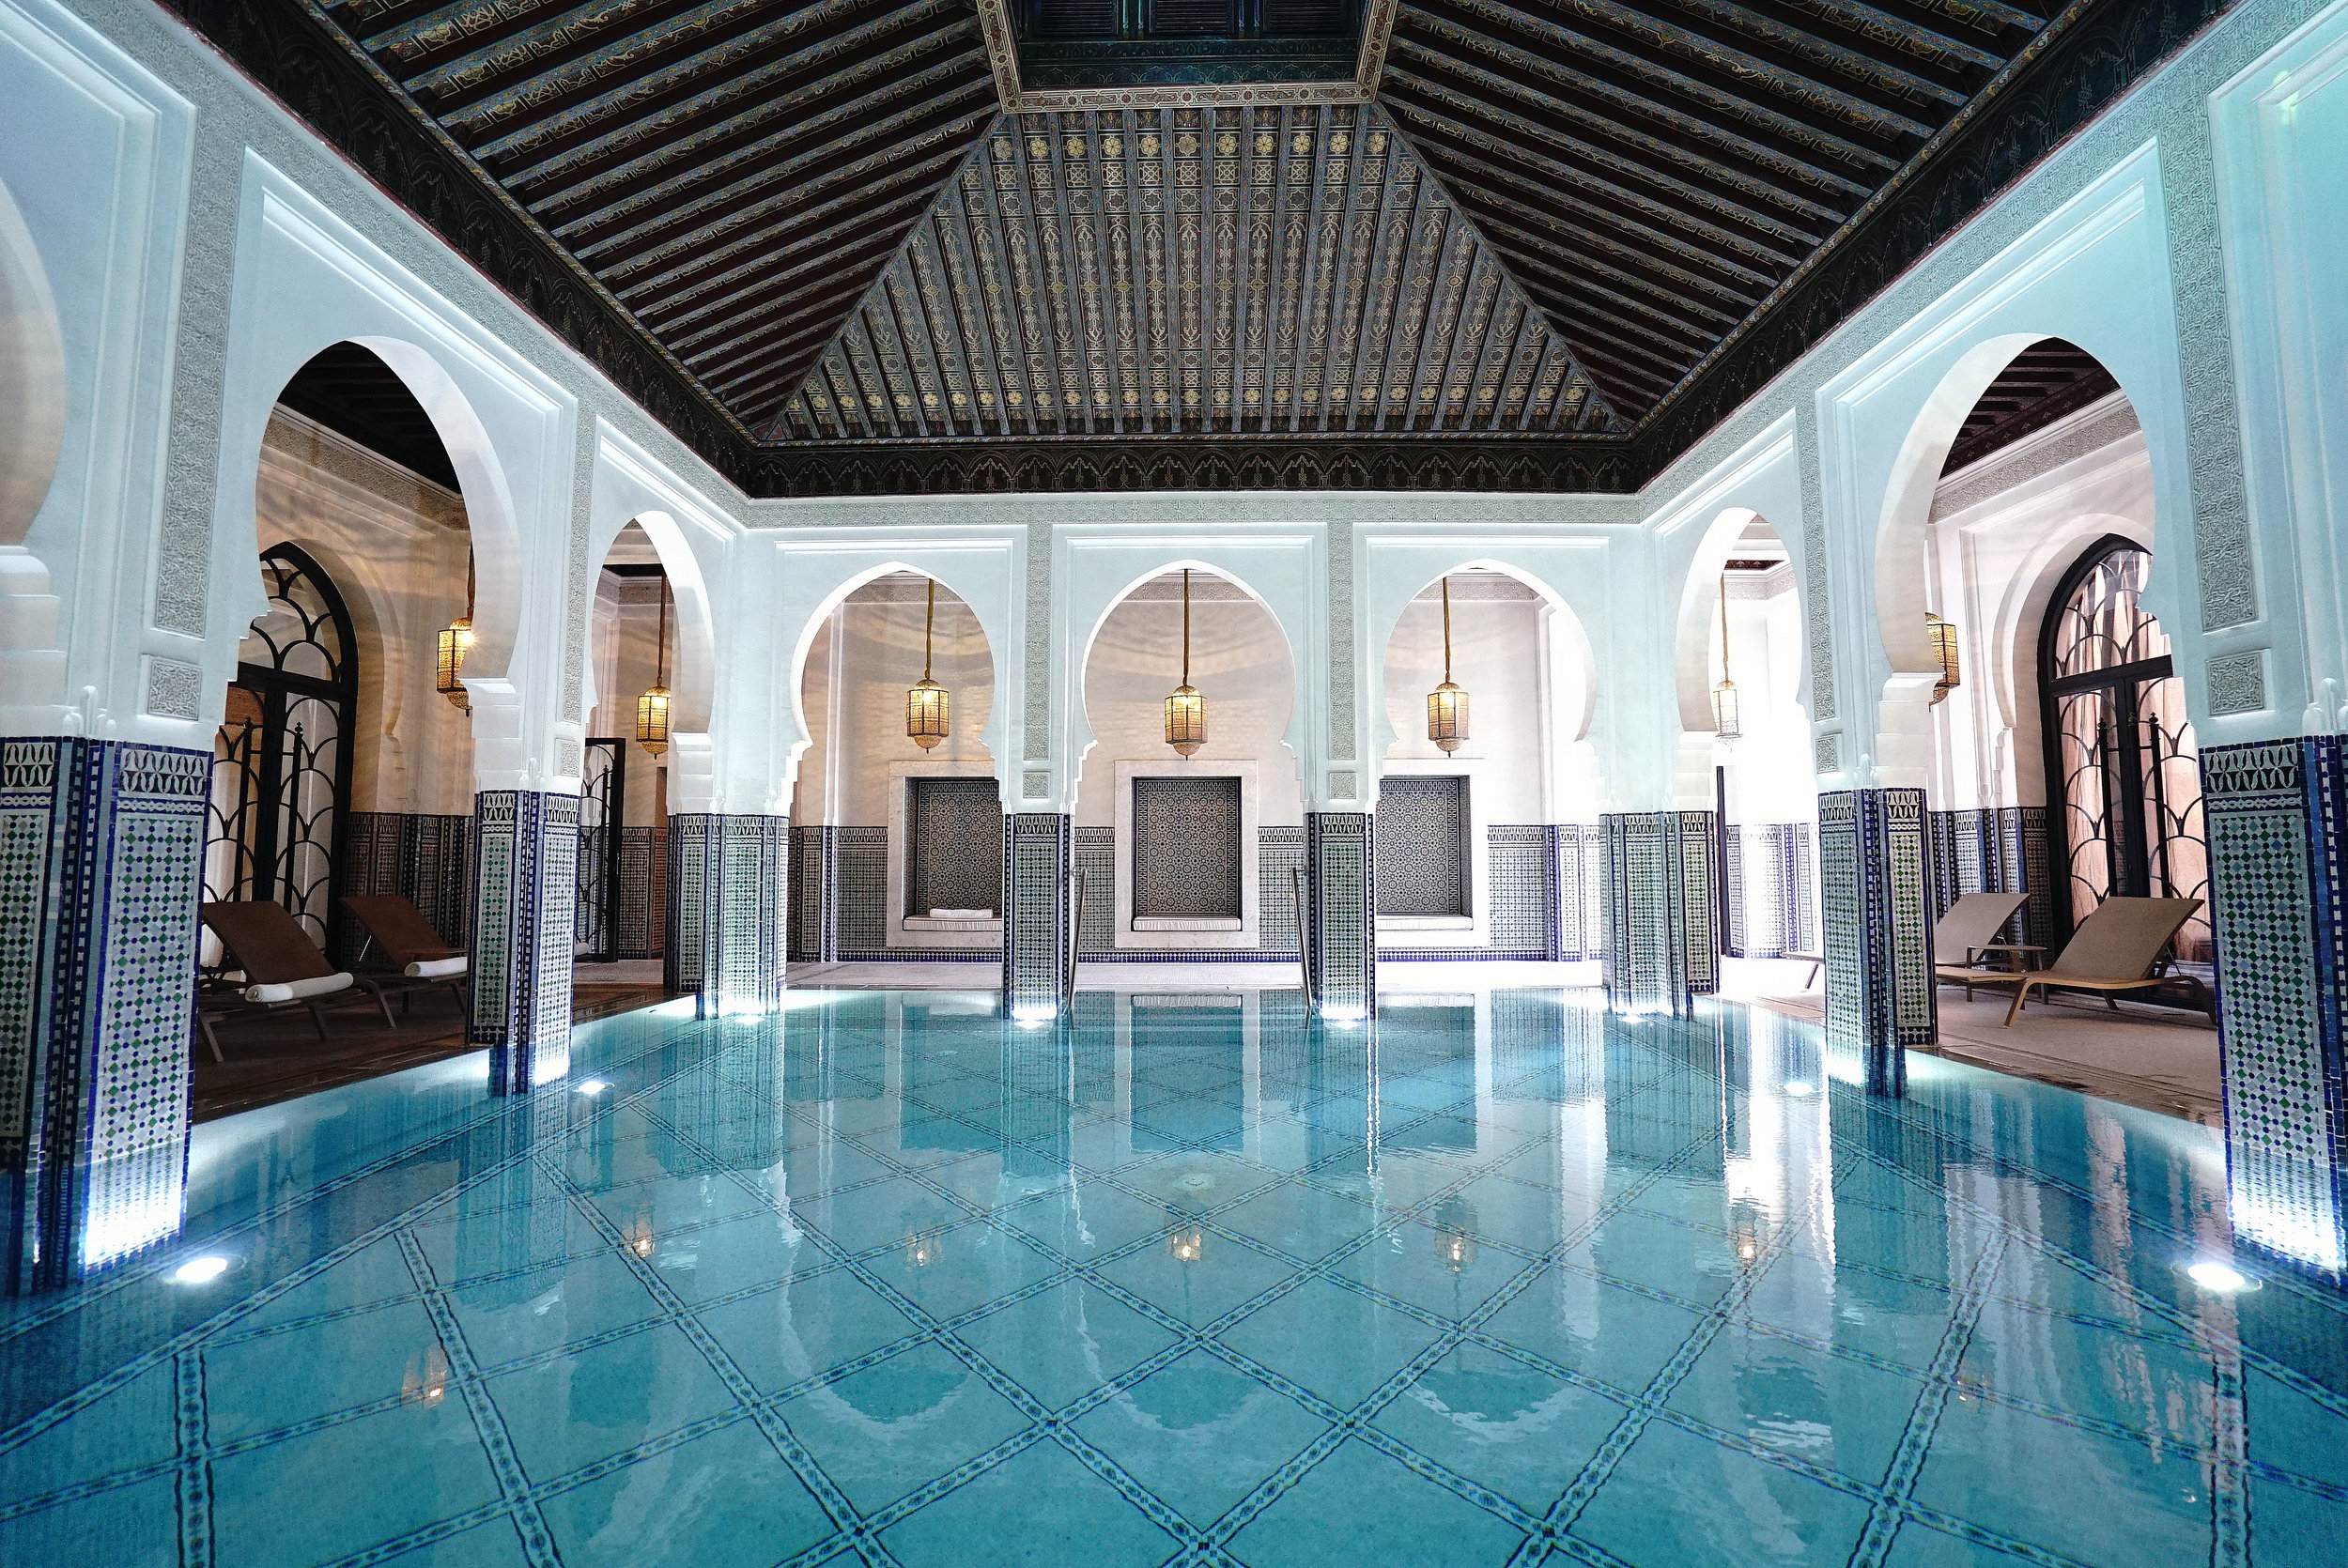 La Mamounia Morocco Indoor Swimming Pool 2.jpg